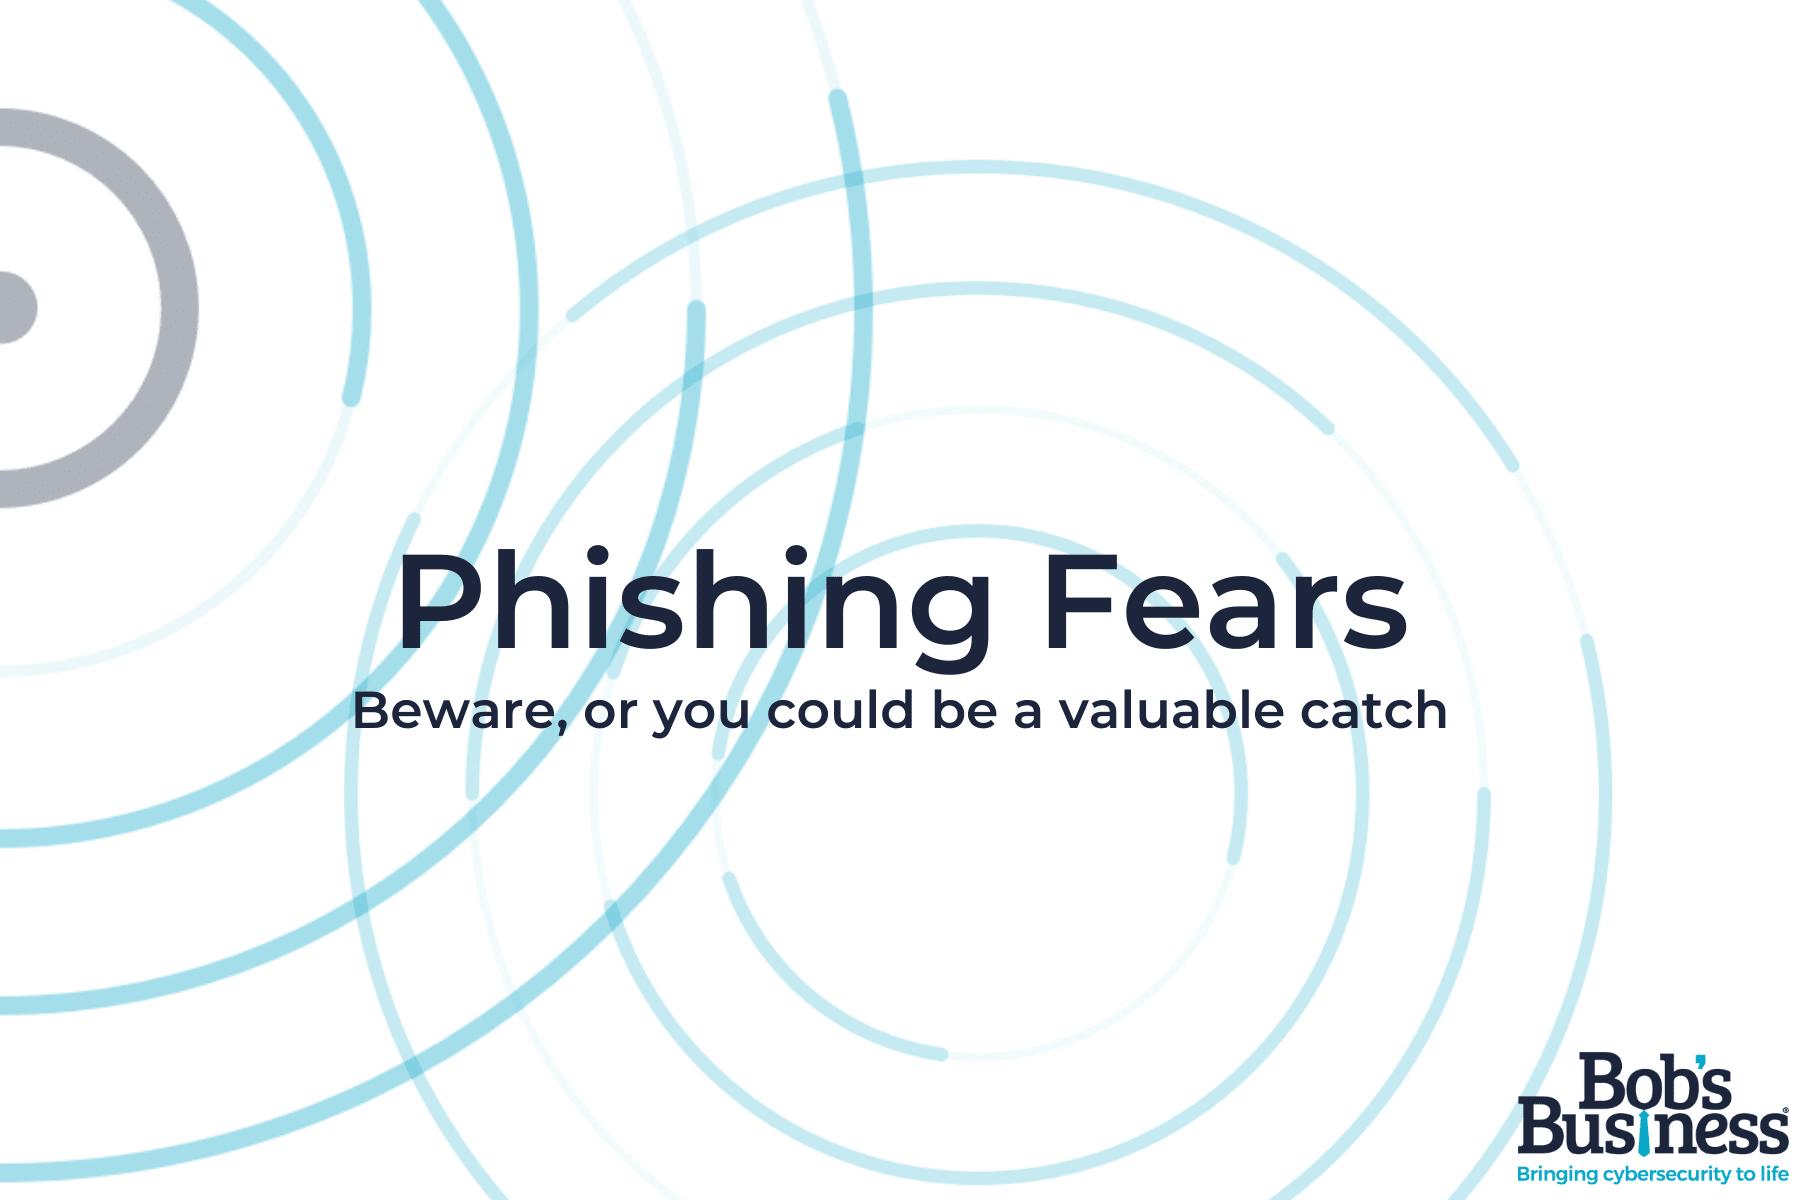 Phishing Fears